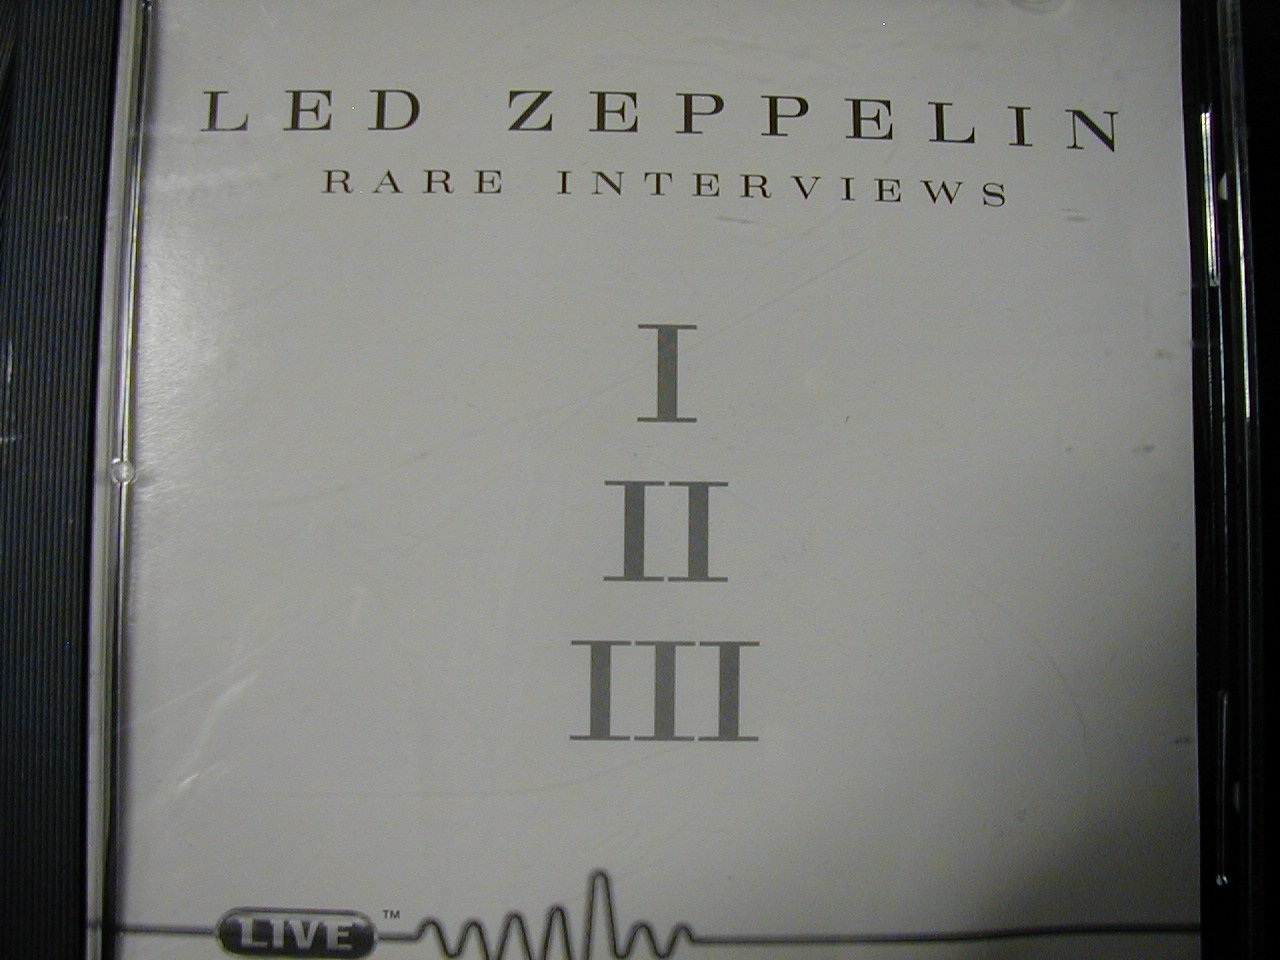 Led Zeppelin Rare Interviews I II III